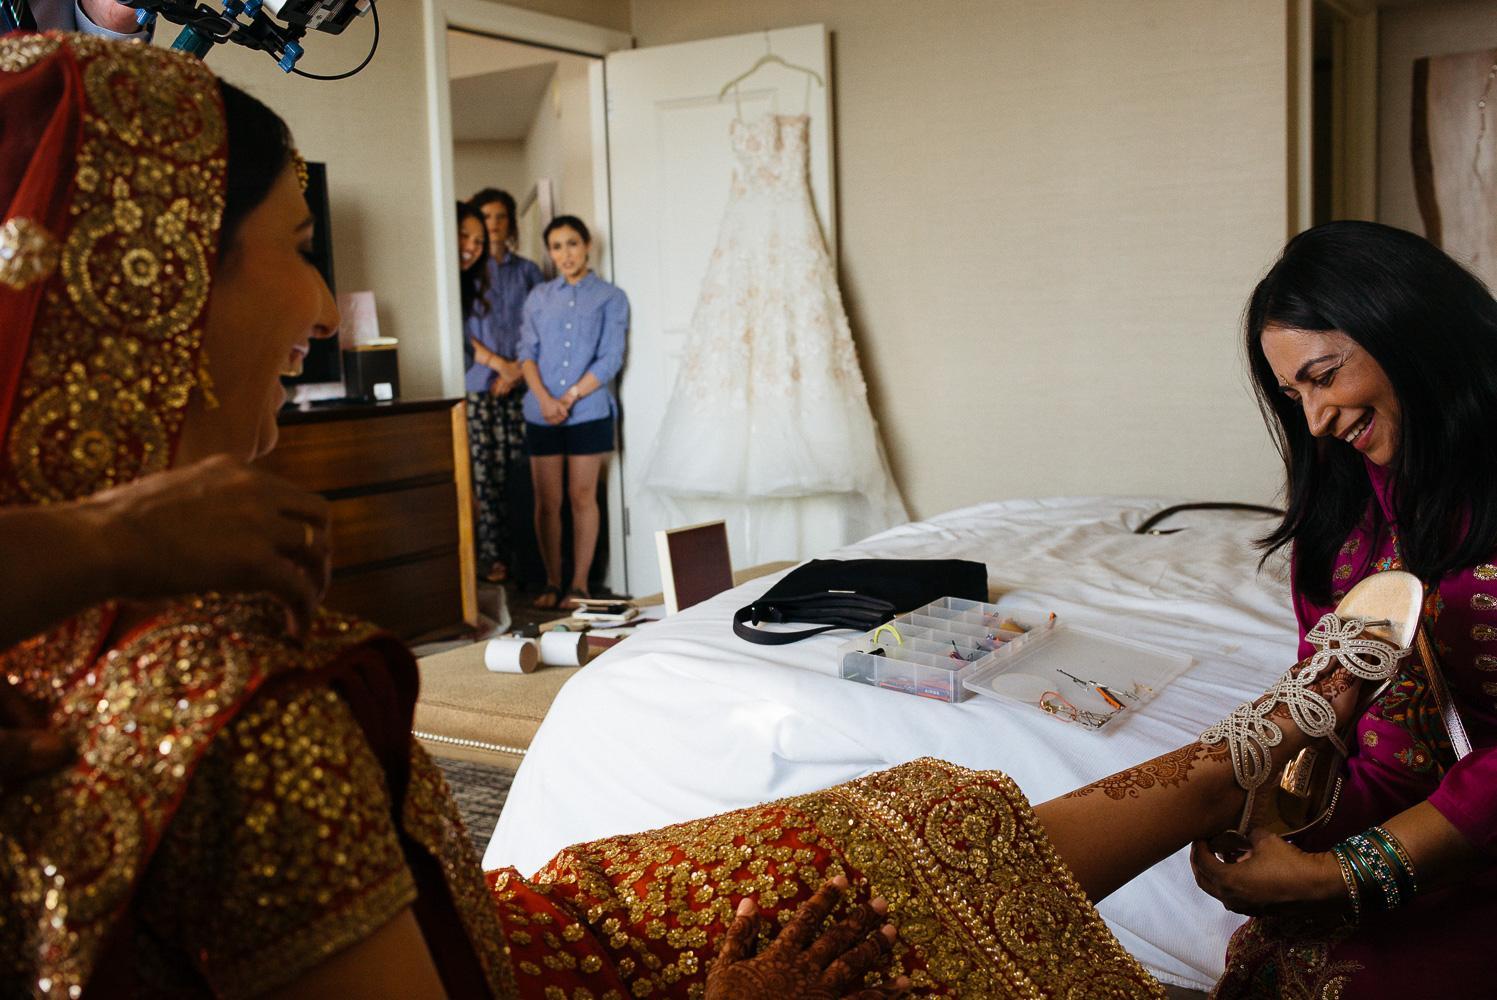 Bridesmaids react to Hindu bride Hindu Jewish fusion wedding Sugar Land Marriott Hotel Texas-024